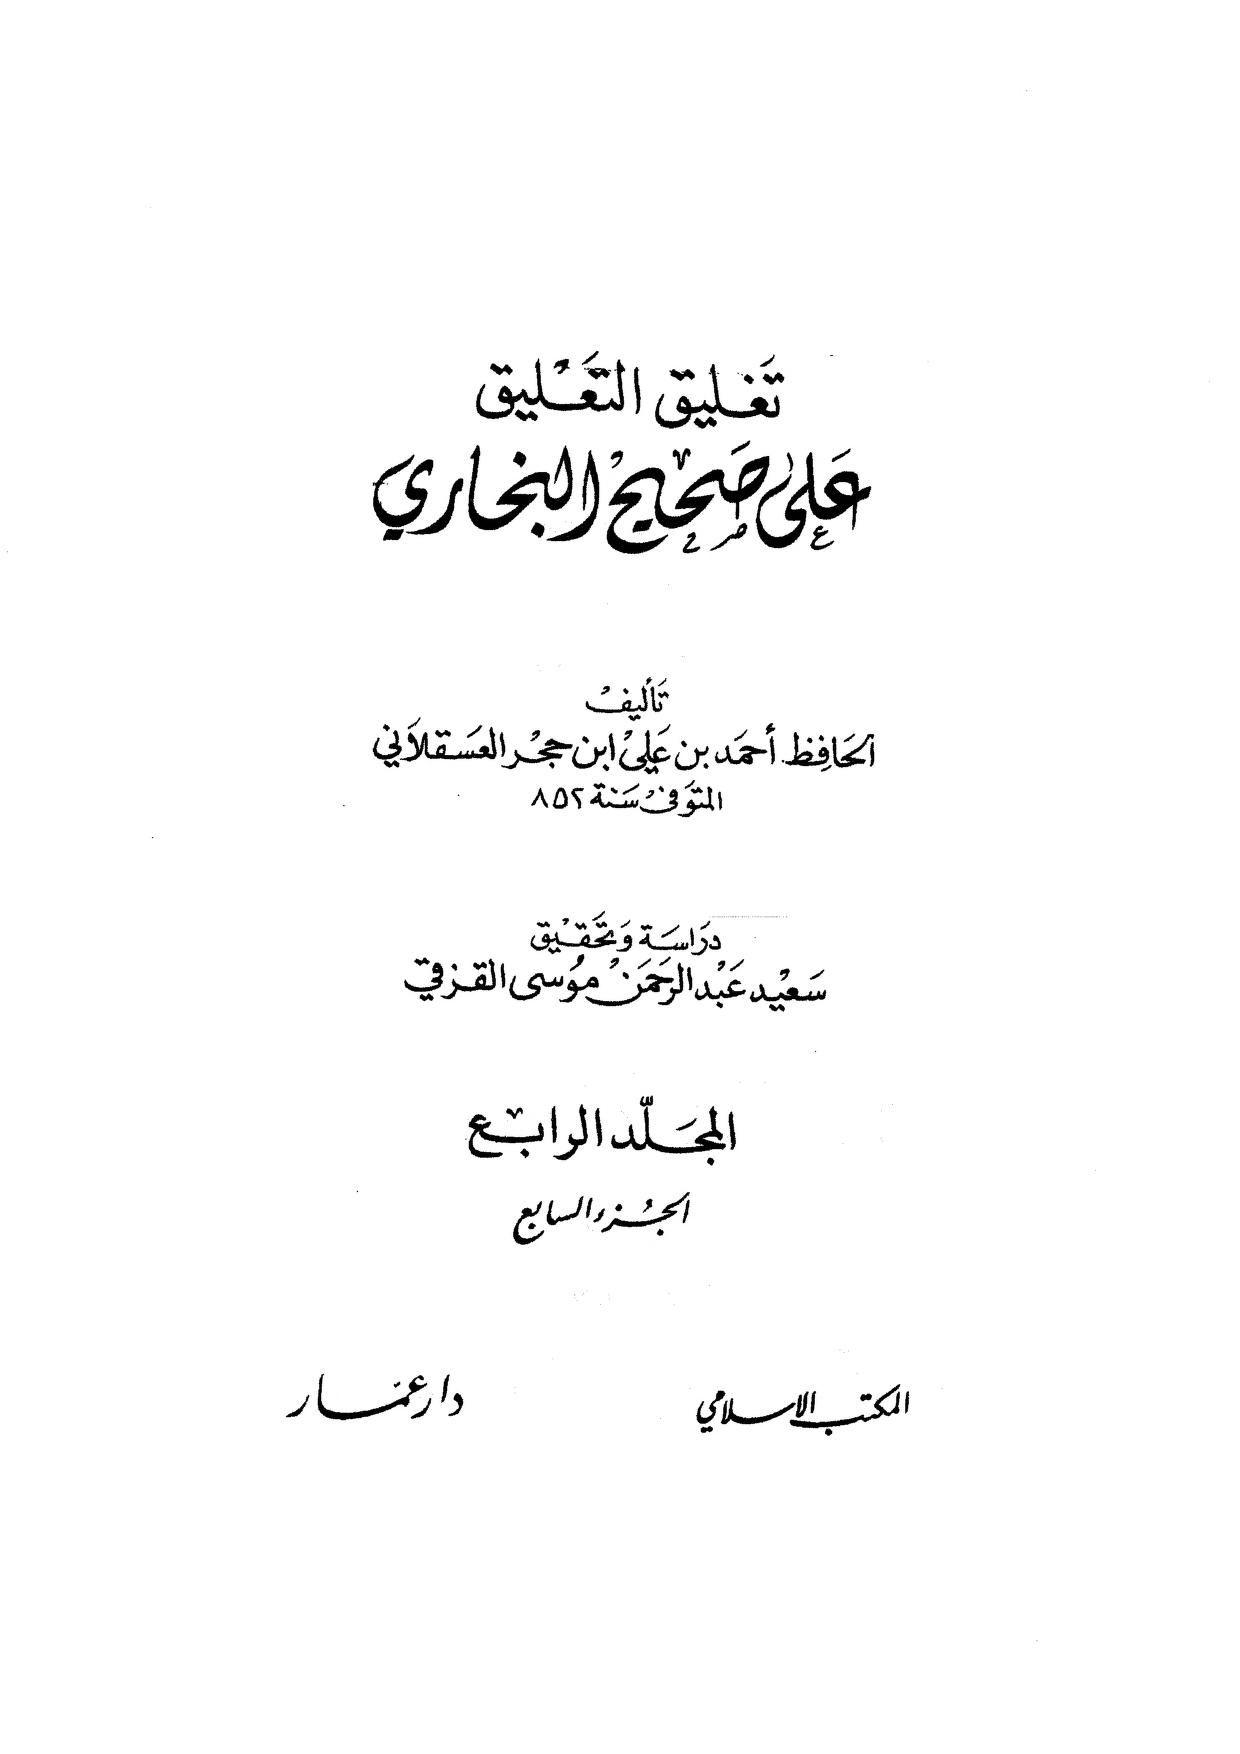 P Book 181 Mutawaffiki Mumeetuka Ibne Abbas Bukhari Mindroastermir Free Download Borrow And Streaming Internet Archive Books Abba Internet Archive